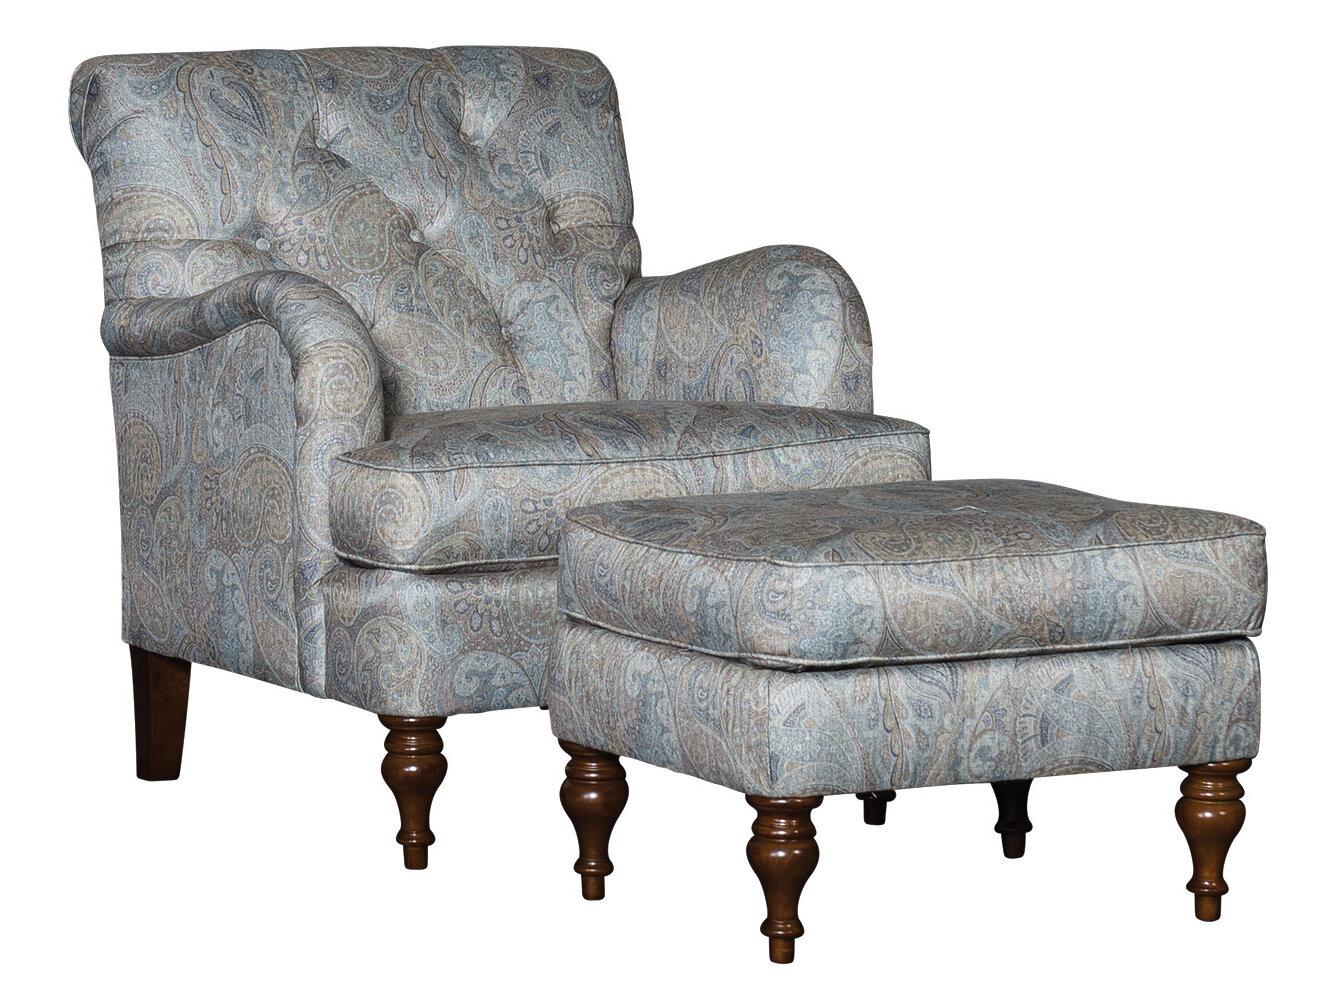 culbreth armchair and ottoman